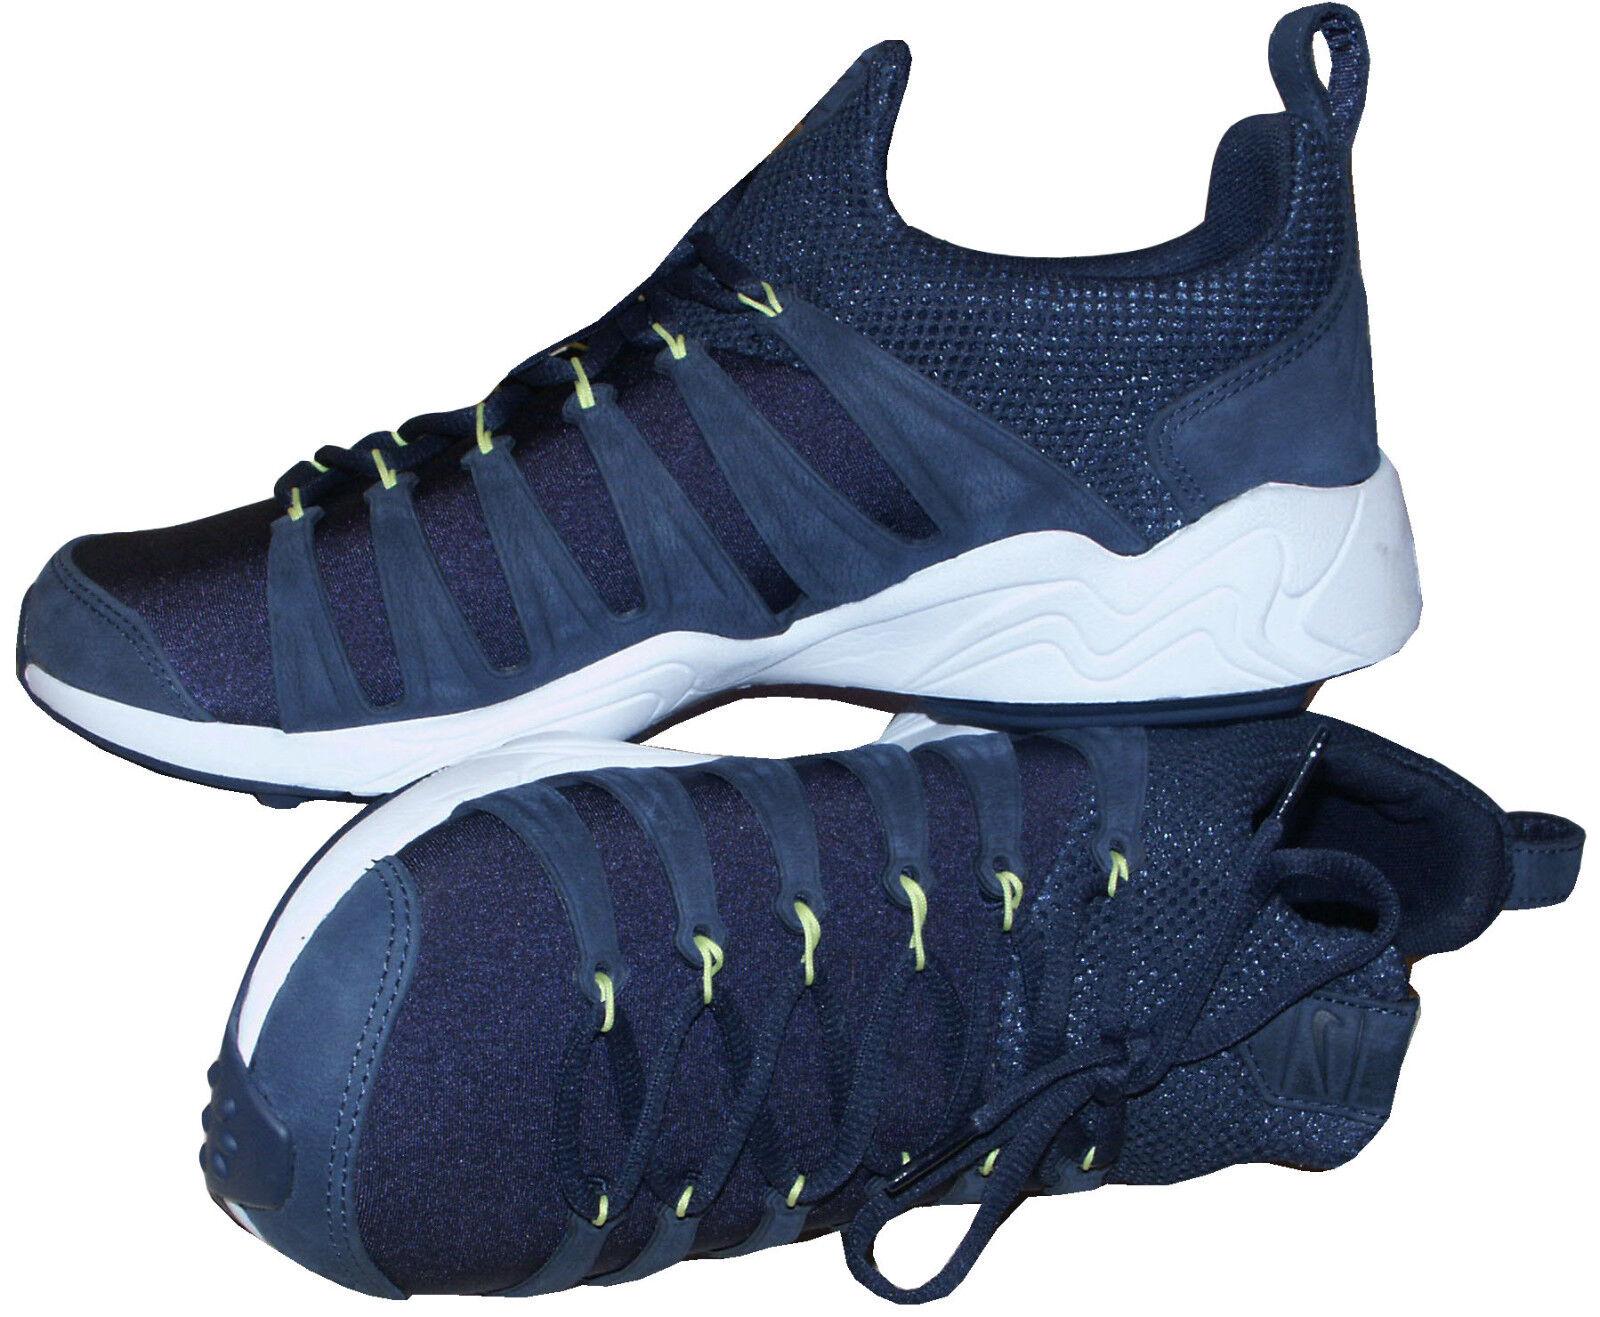 NIKE NAVY AIR ZOOM SPIRIMIC LIGHTWEIGHT NAVY NIKE TRAINERS / Chaussures RARE SZ:UK8 EU42.5 US9 544660